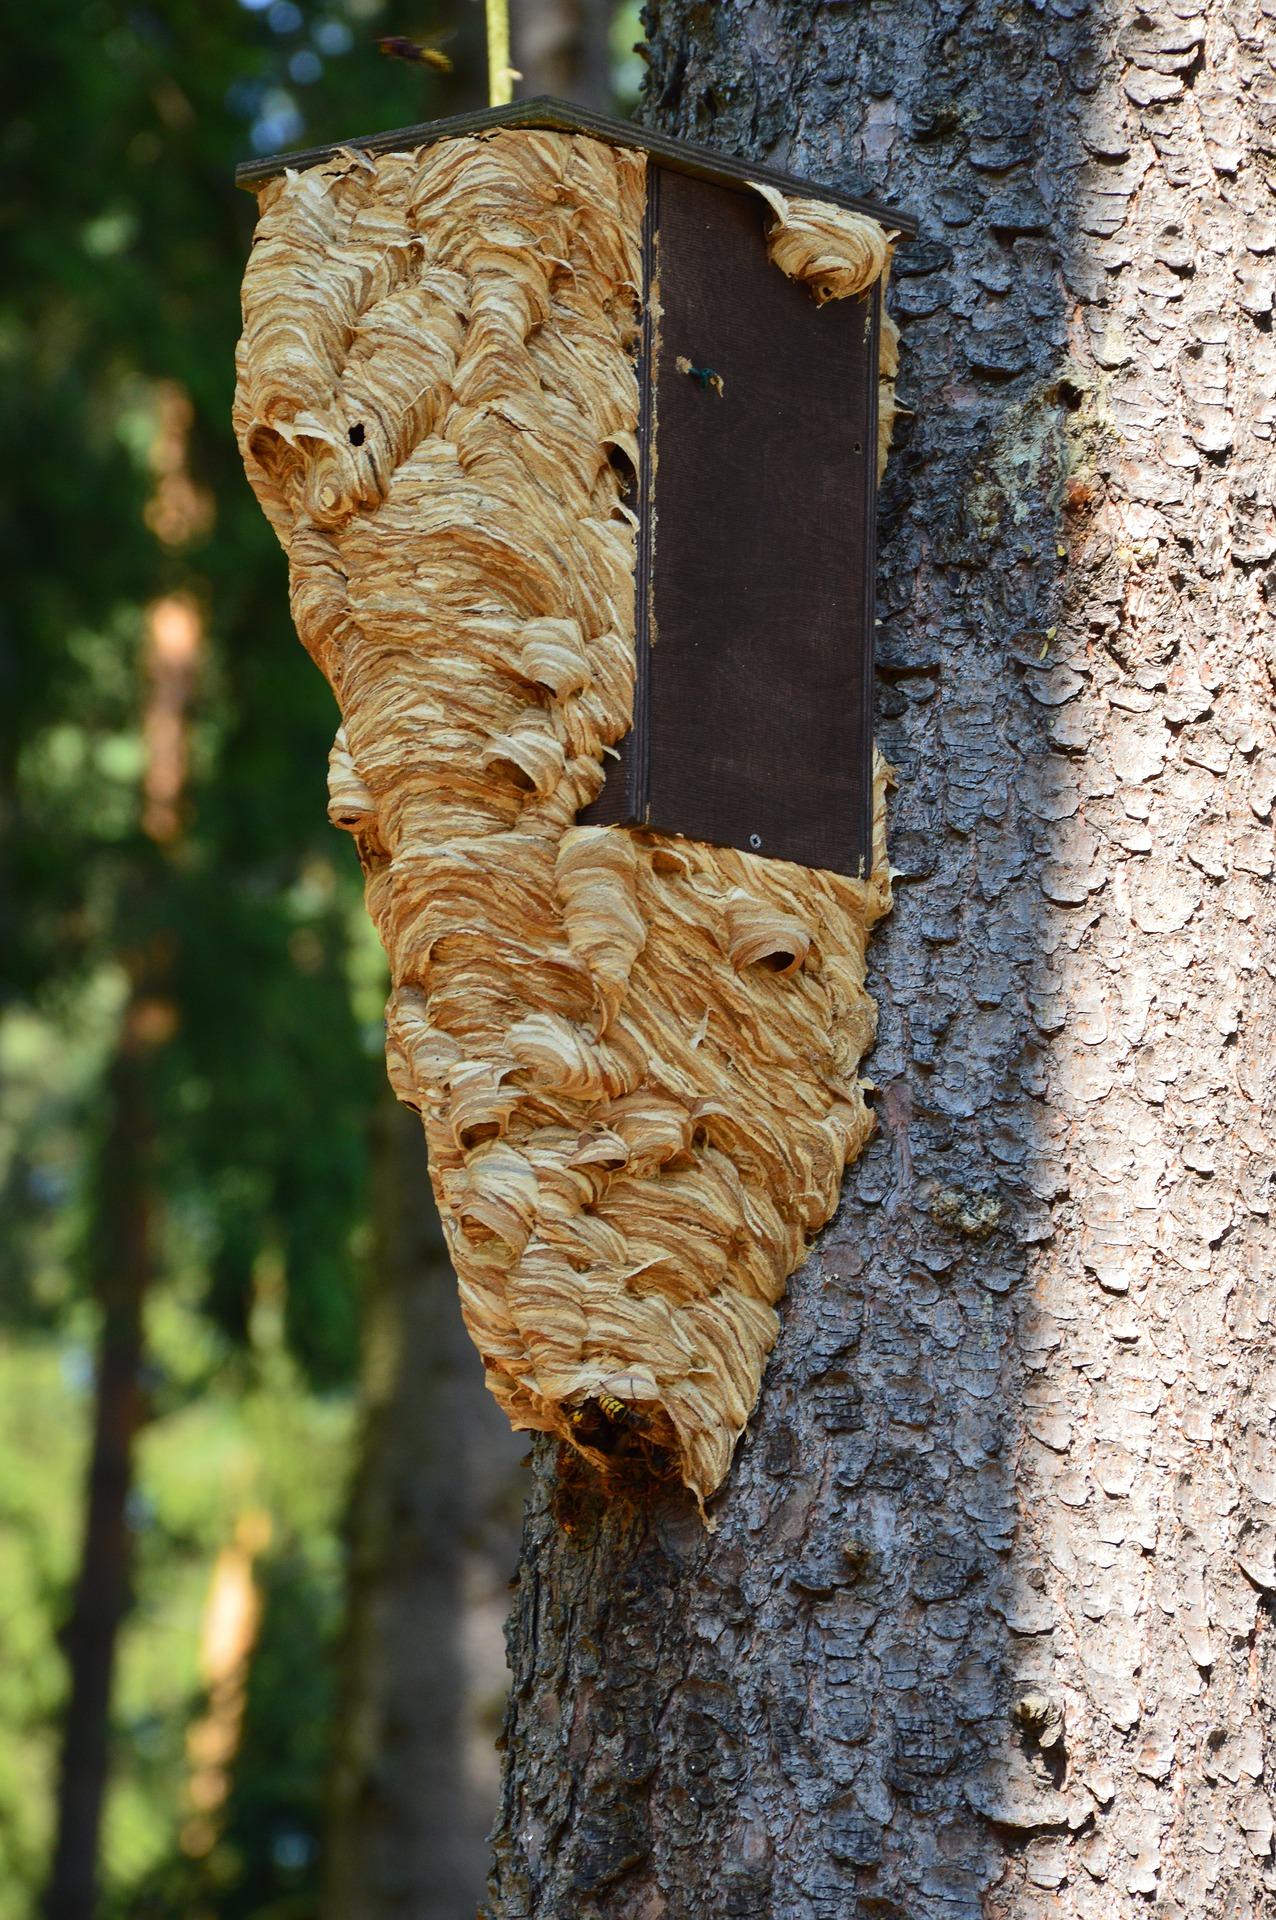 eradication nid de frelons asiatique Pujols 33350